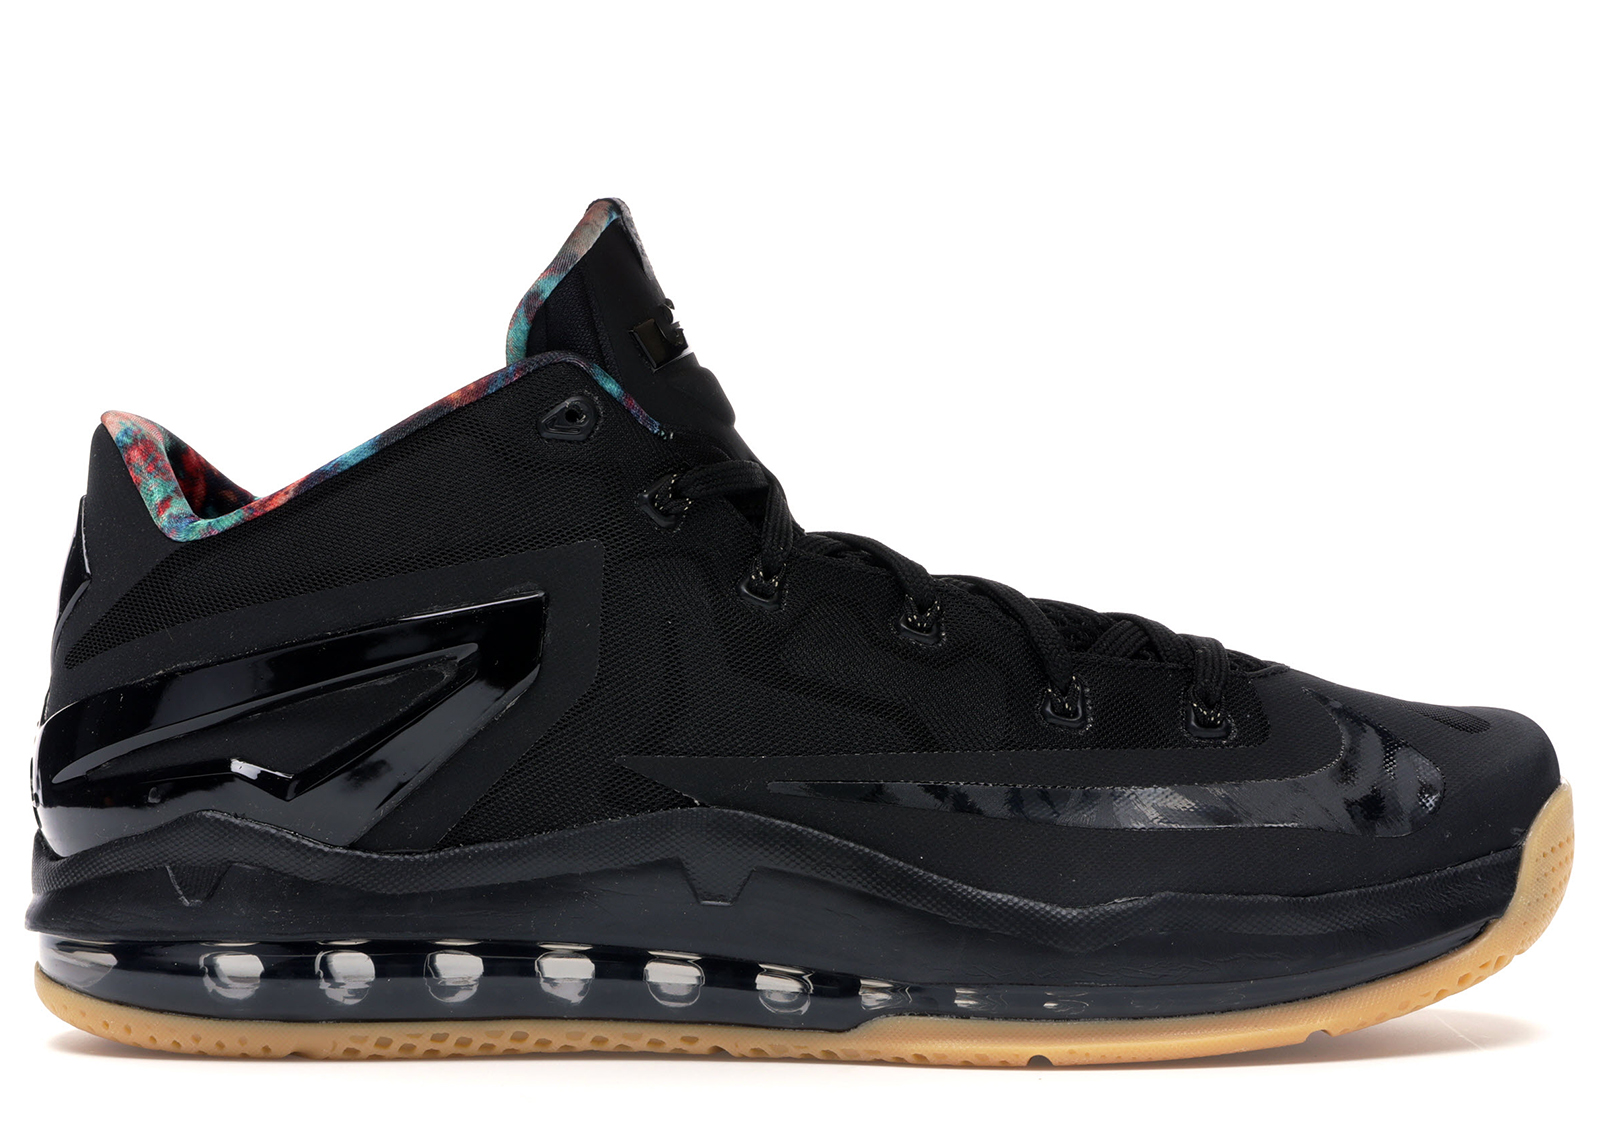 Nike LeBron 11 Low Black Gum - 642849-078